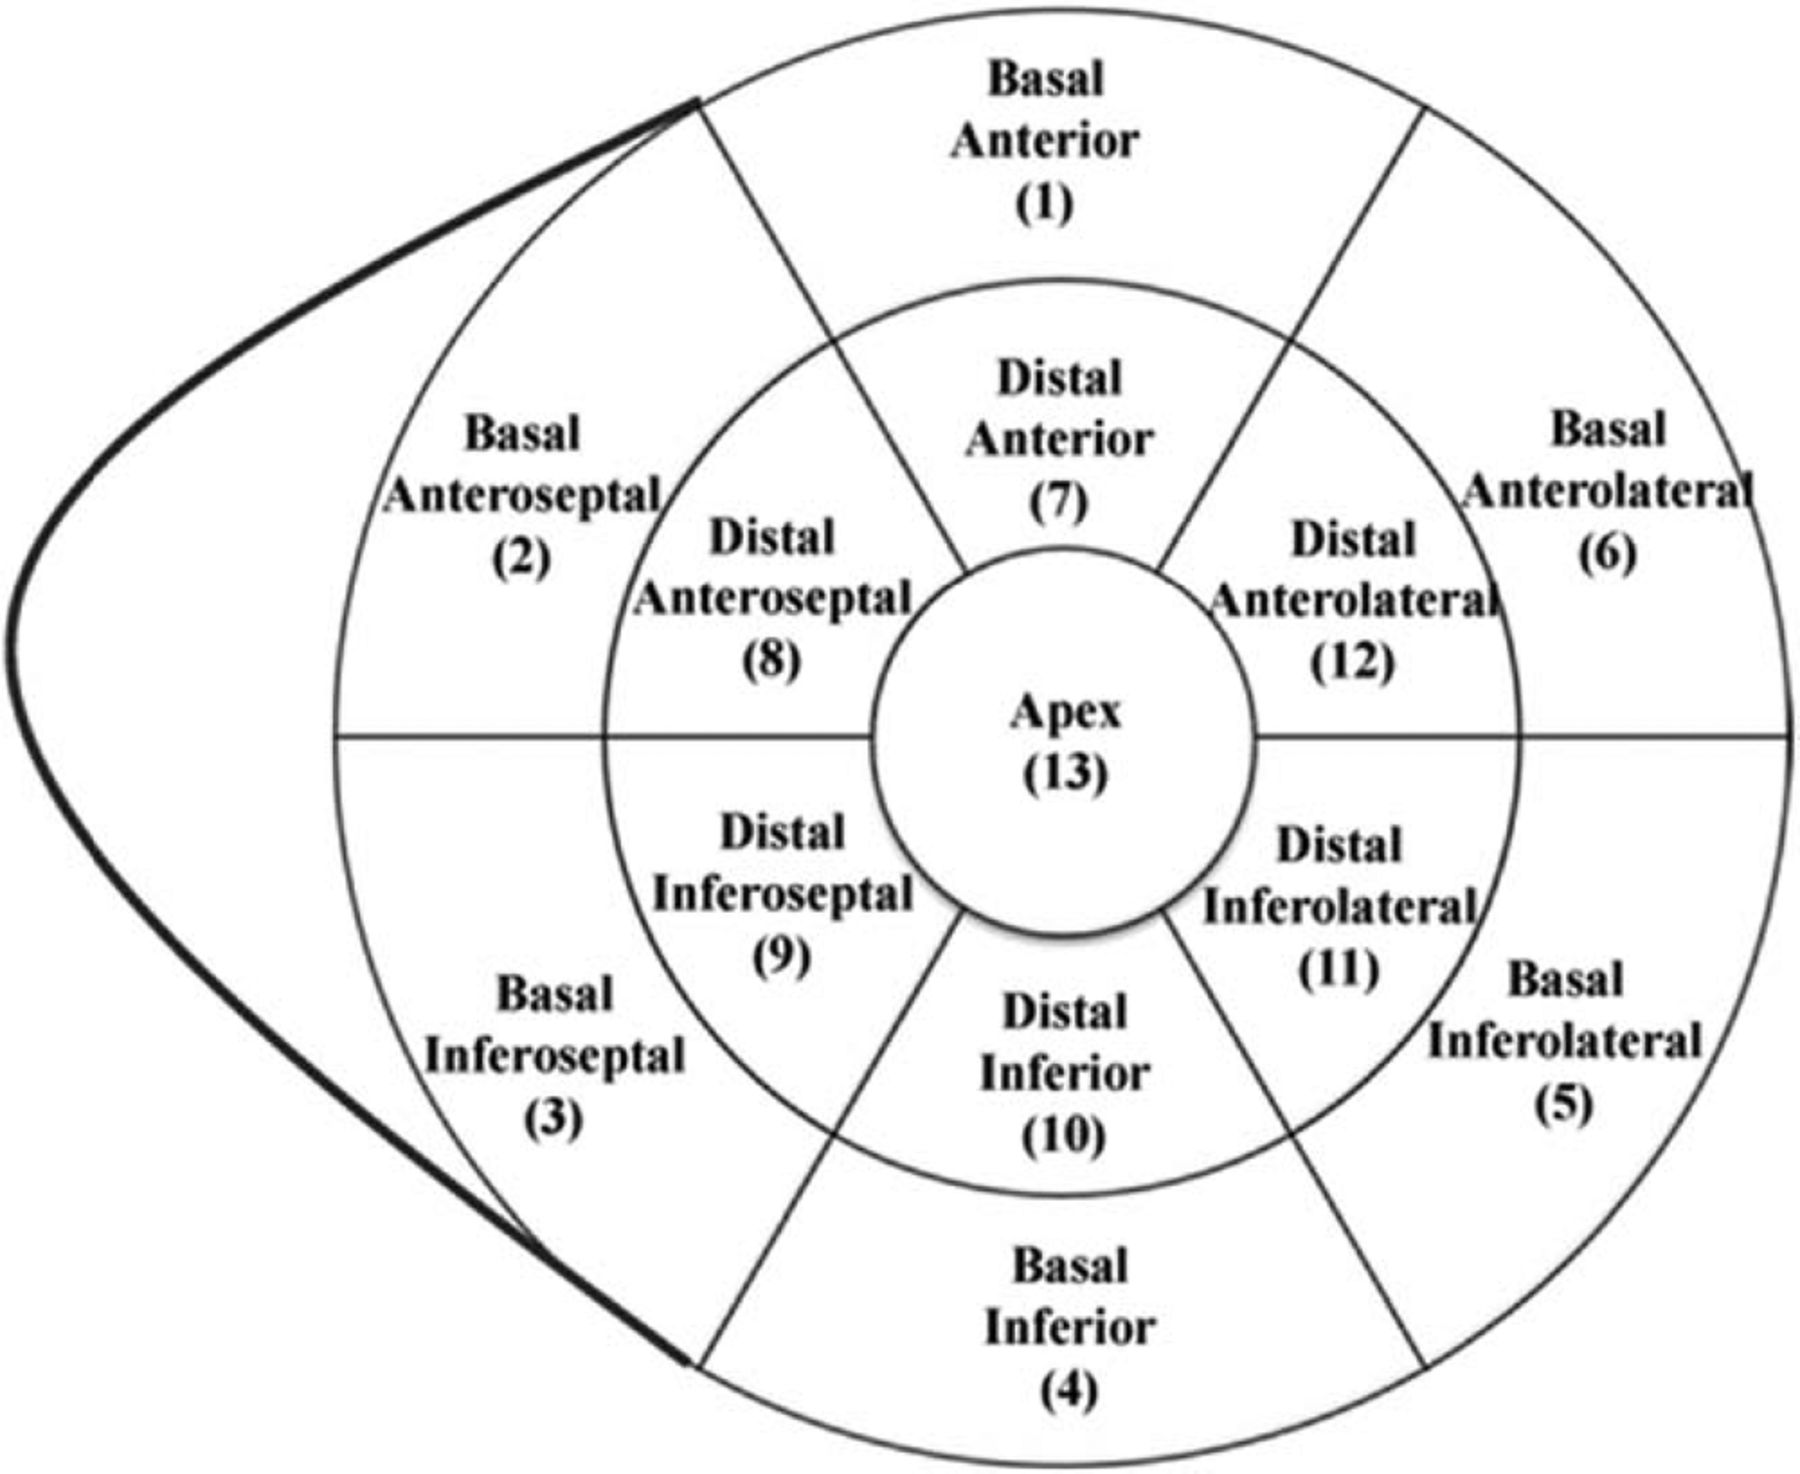 Aligning Coronary Anatomy and Myocardial Perfusion